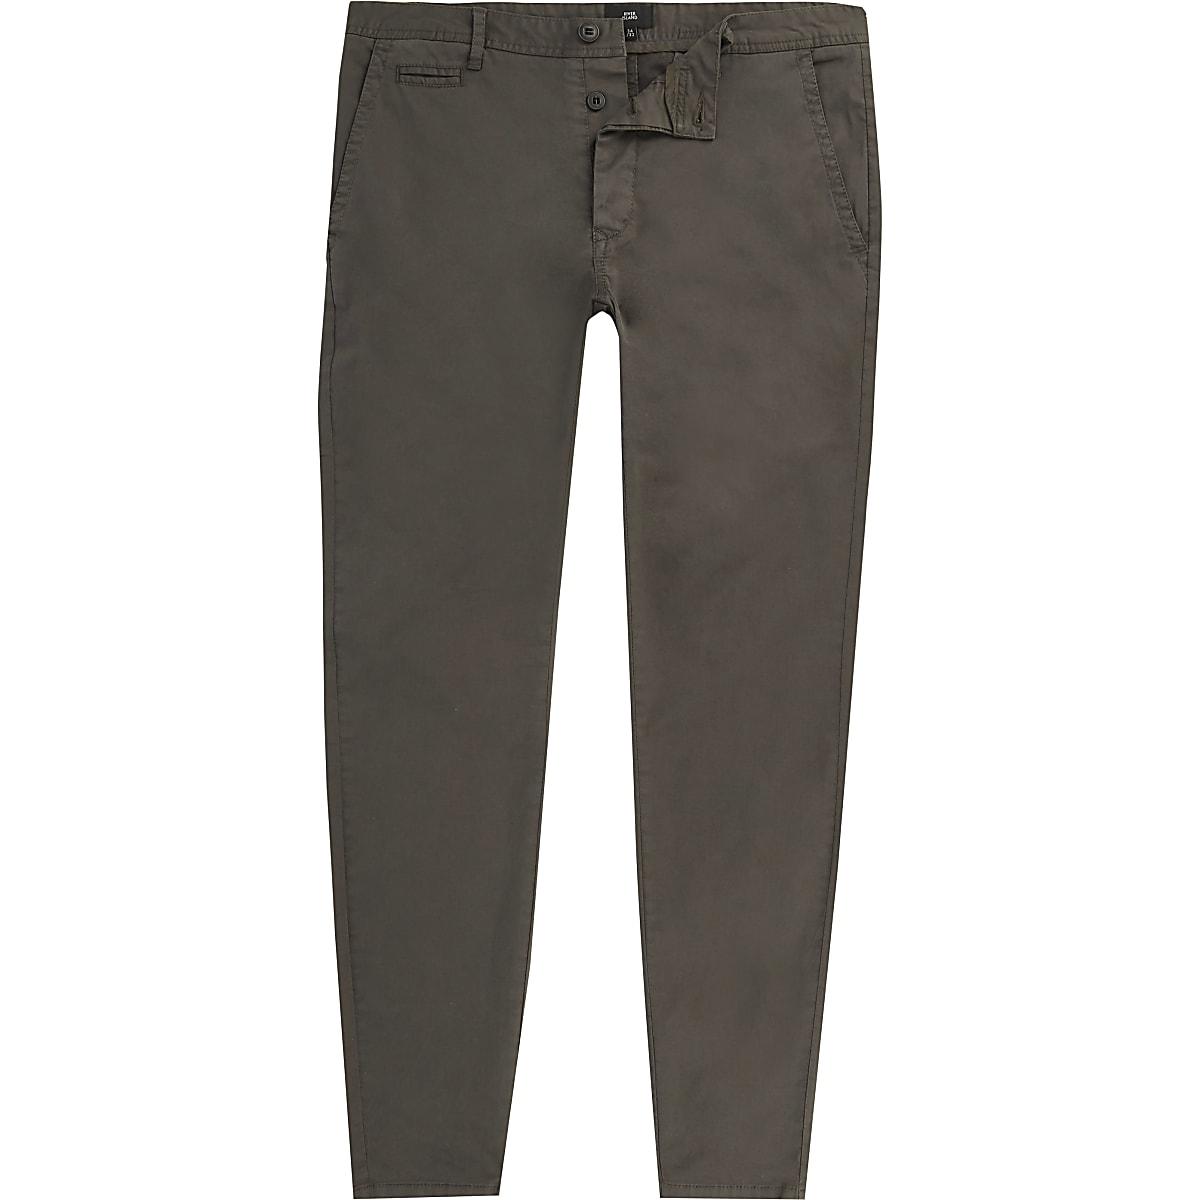 Dark grey super skinny fit chino pants